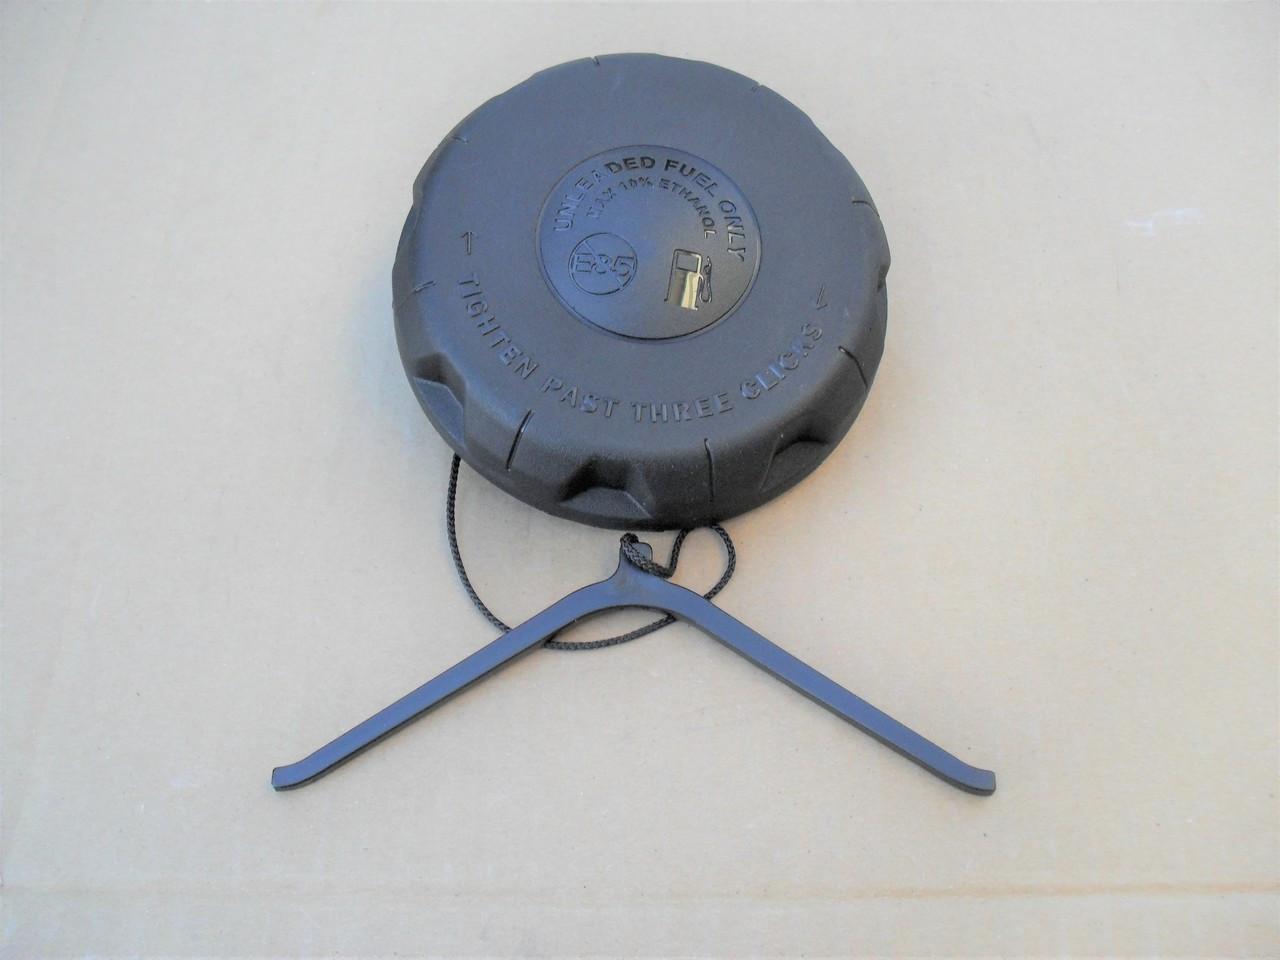 hight resolution of gas fuel cap for troy bilt colt sp 751 3124d 951 3124d 951 3124e id 3 1 4